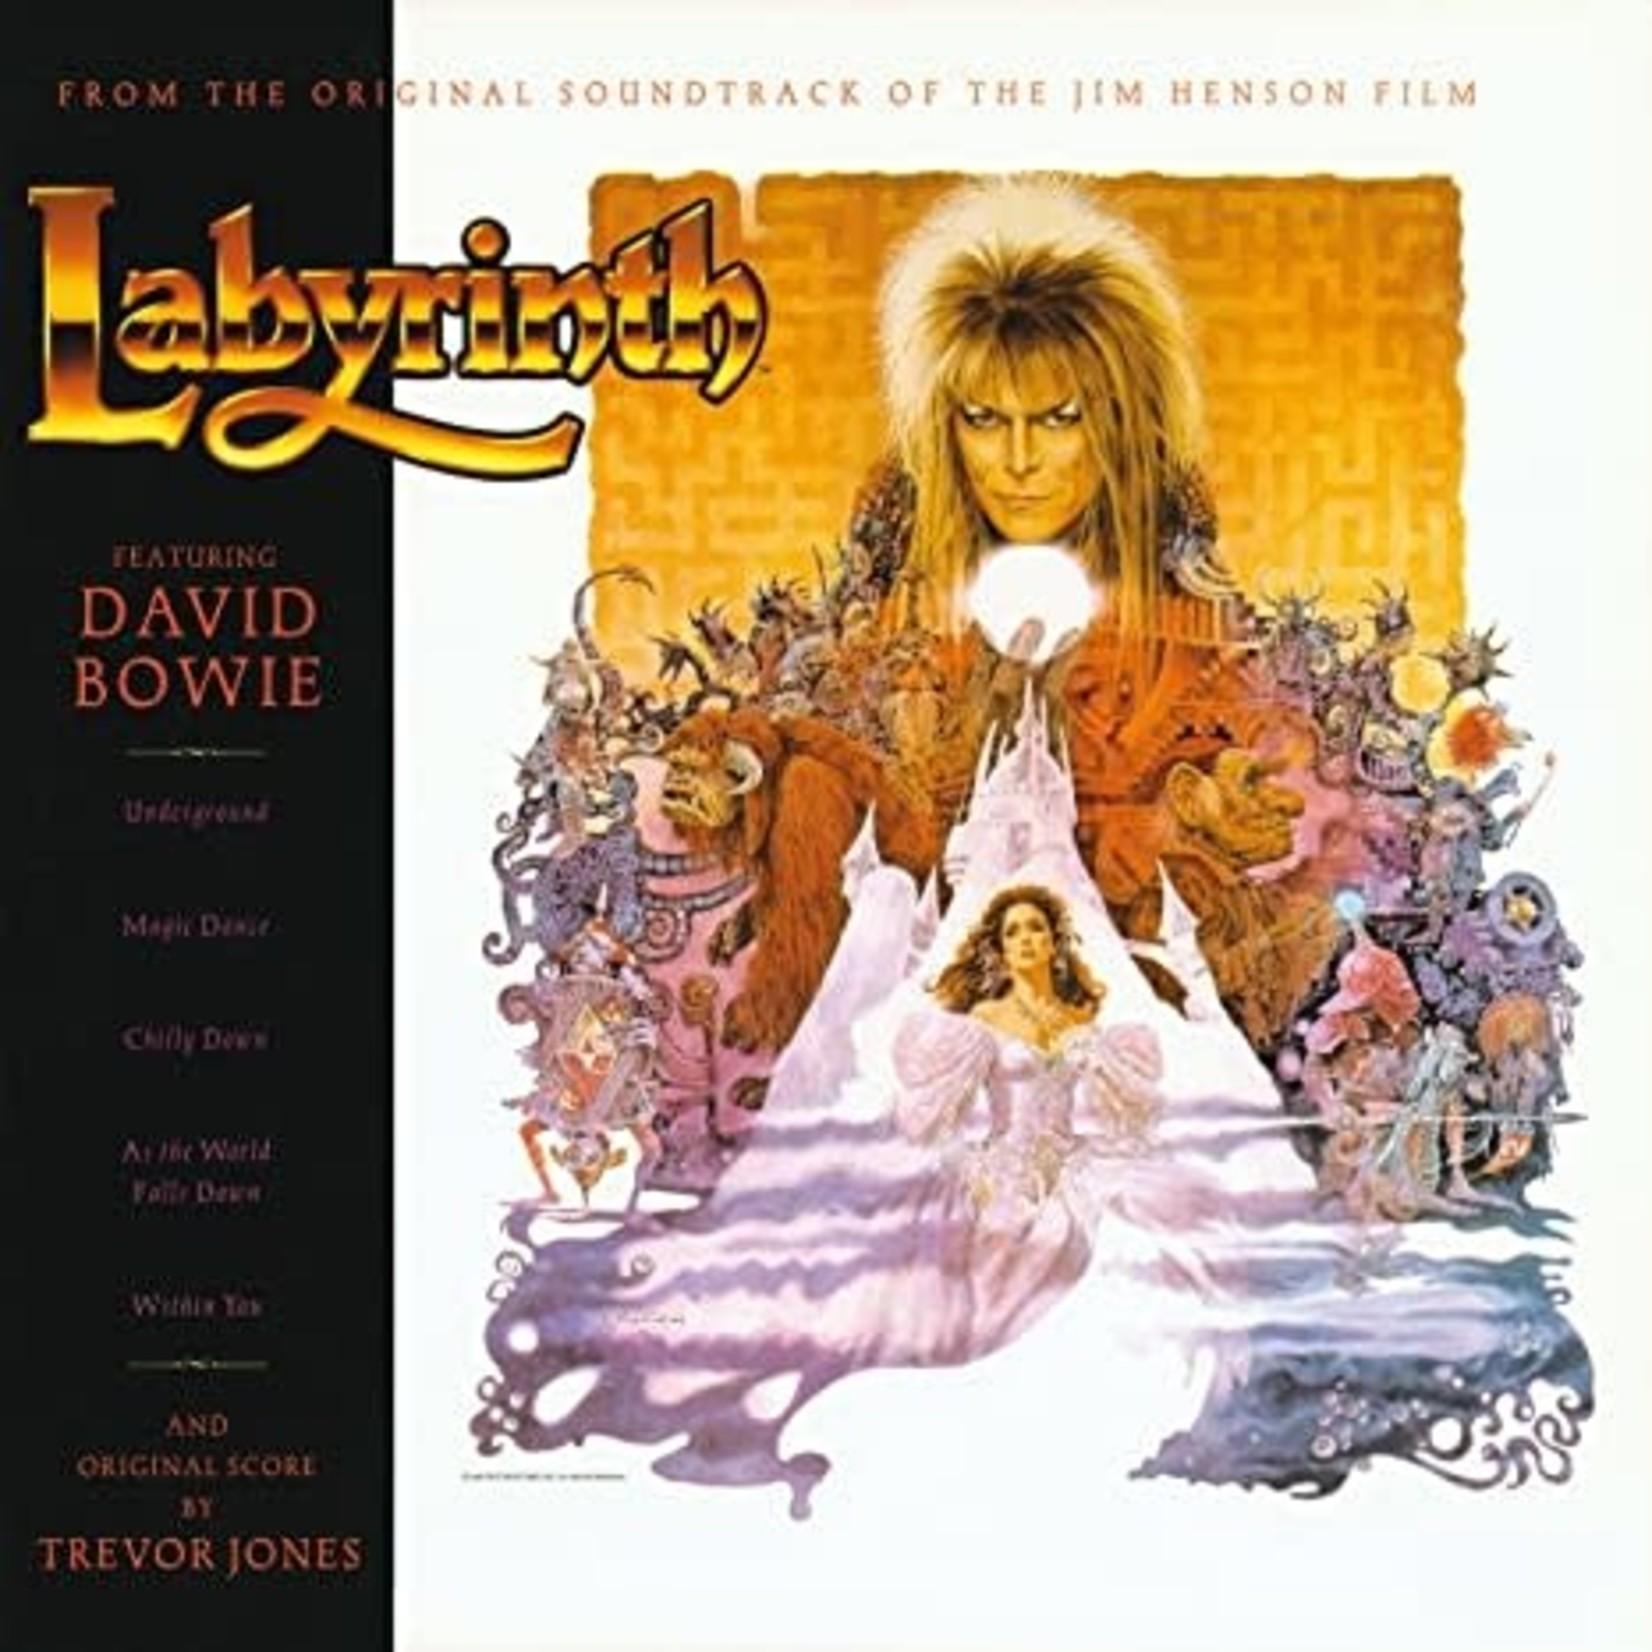 soundtrack: Bowie, David and Trevor Jones: Labyrinth